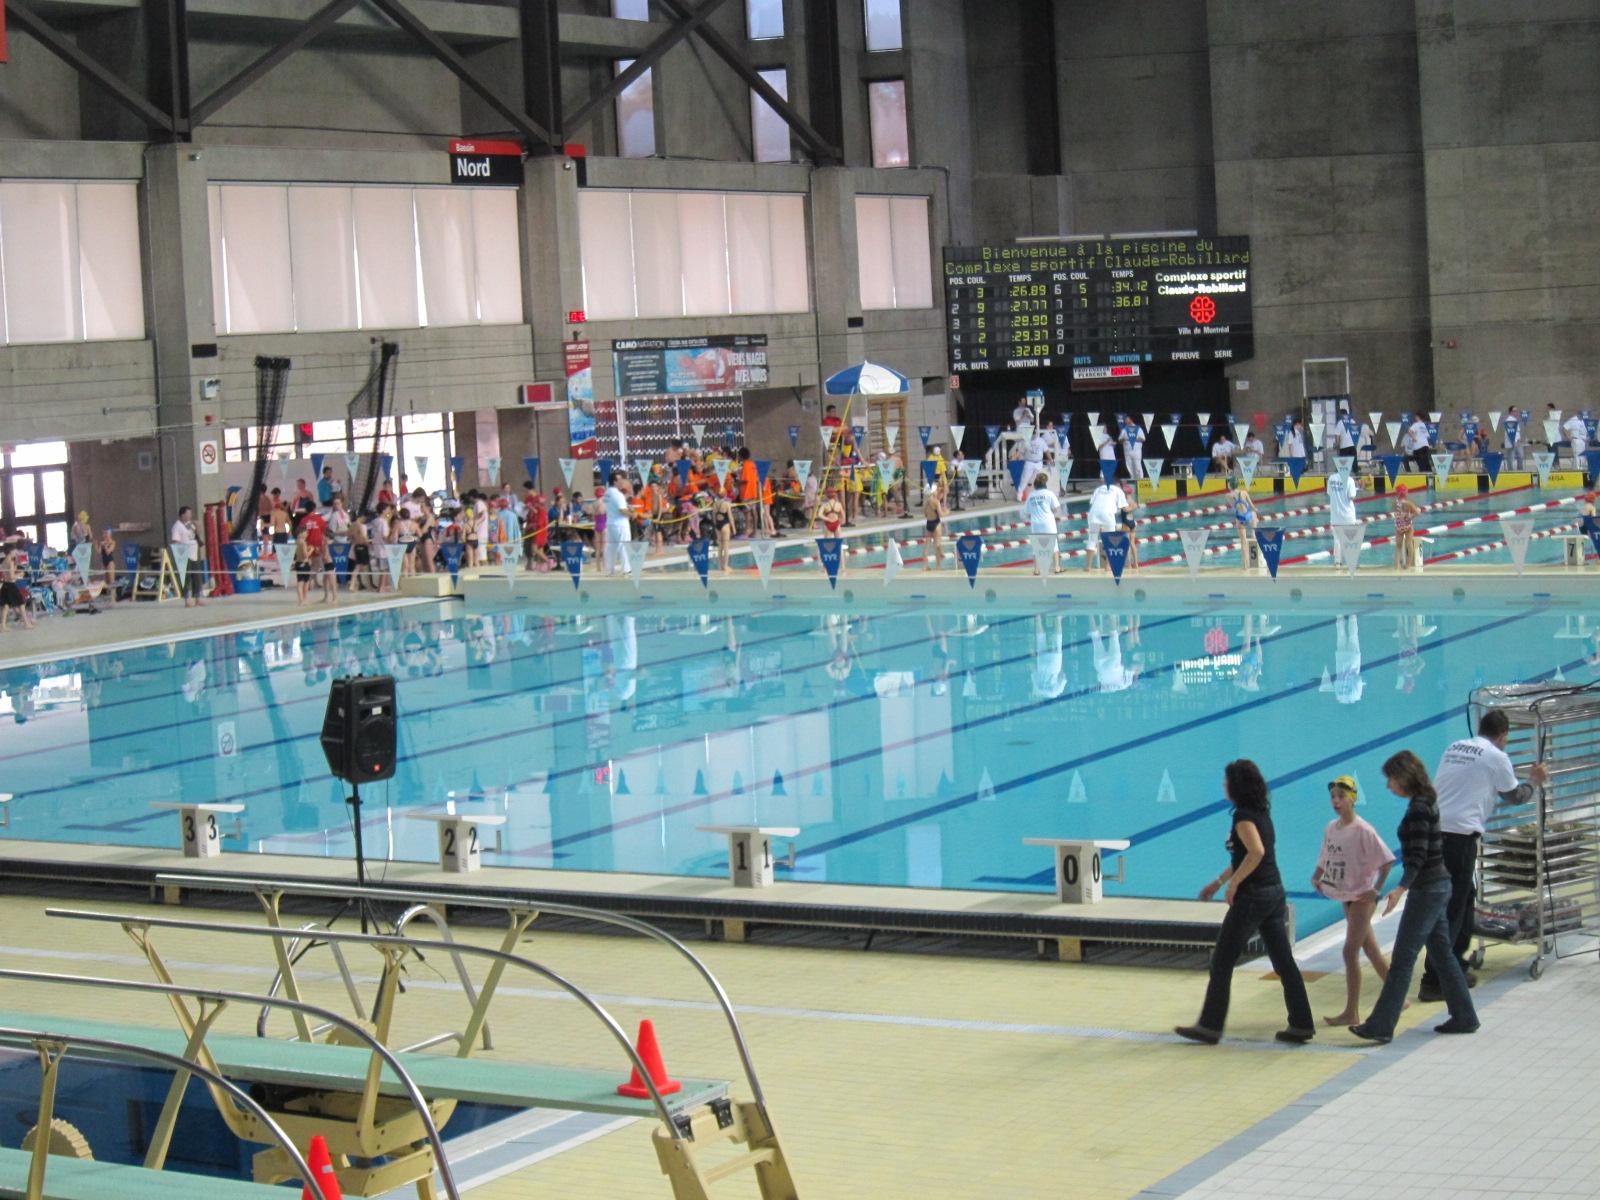 Complexe sportif claude robillard image for Centre sportif terrebonne piscine